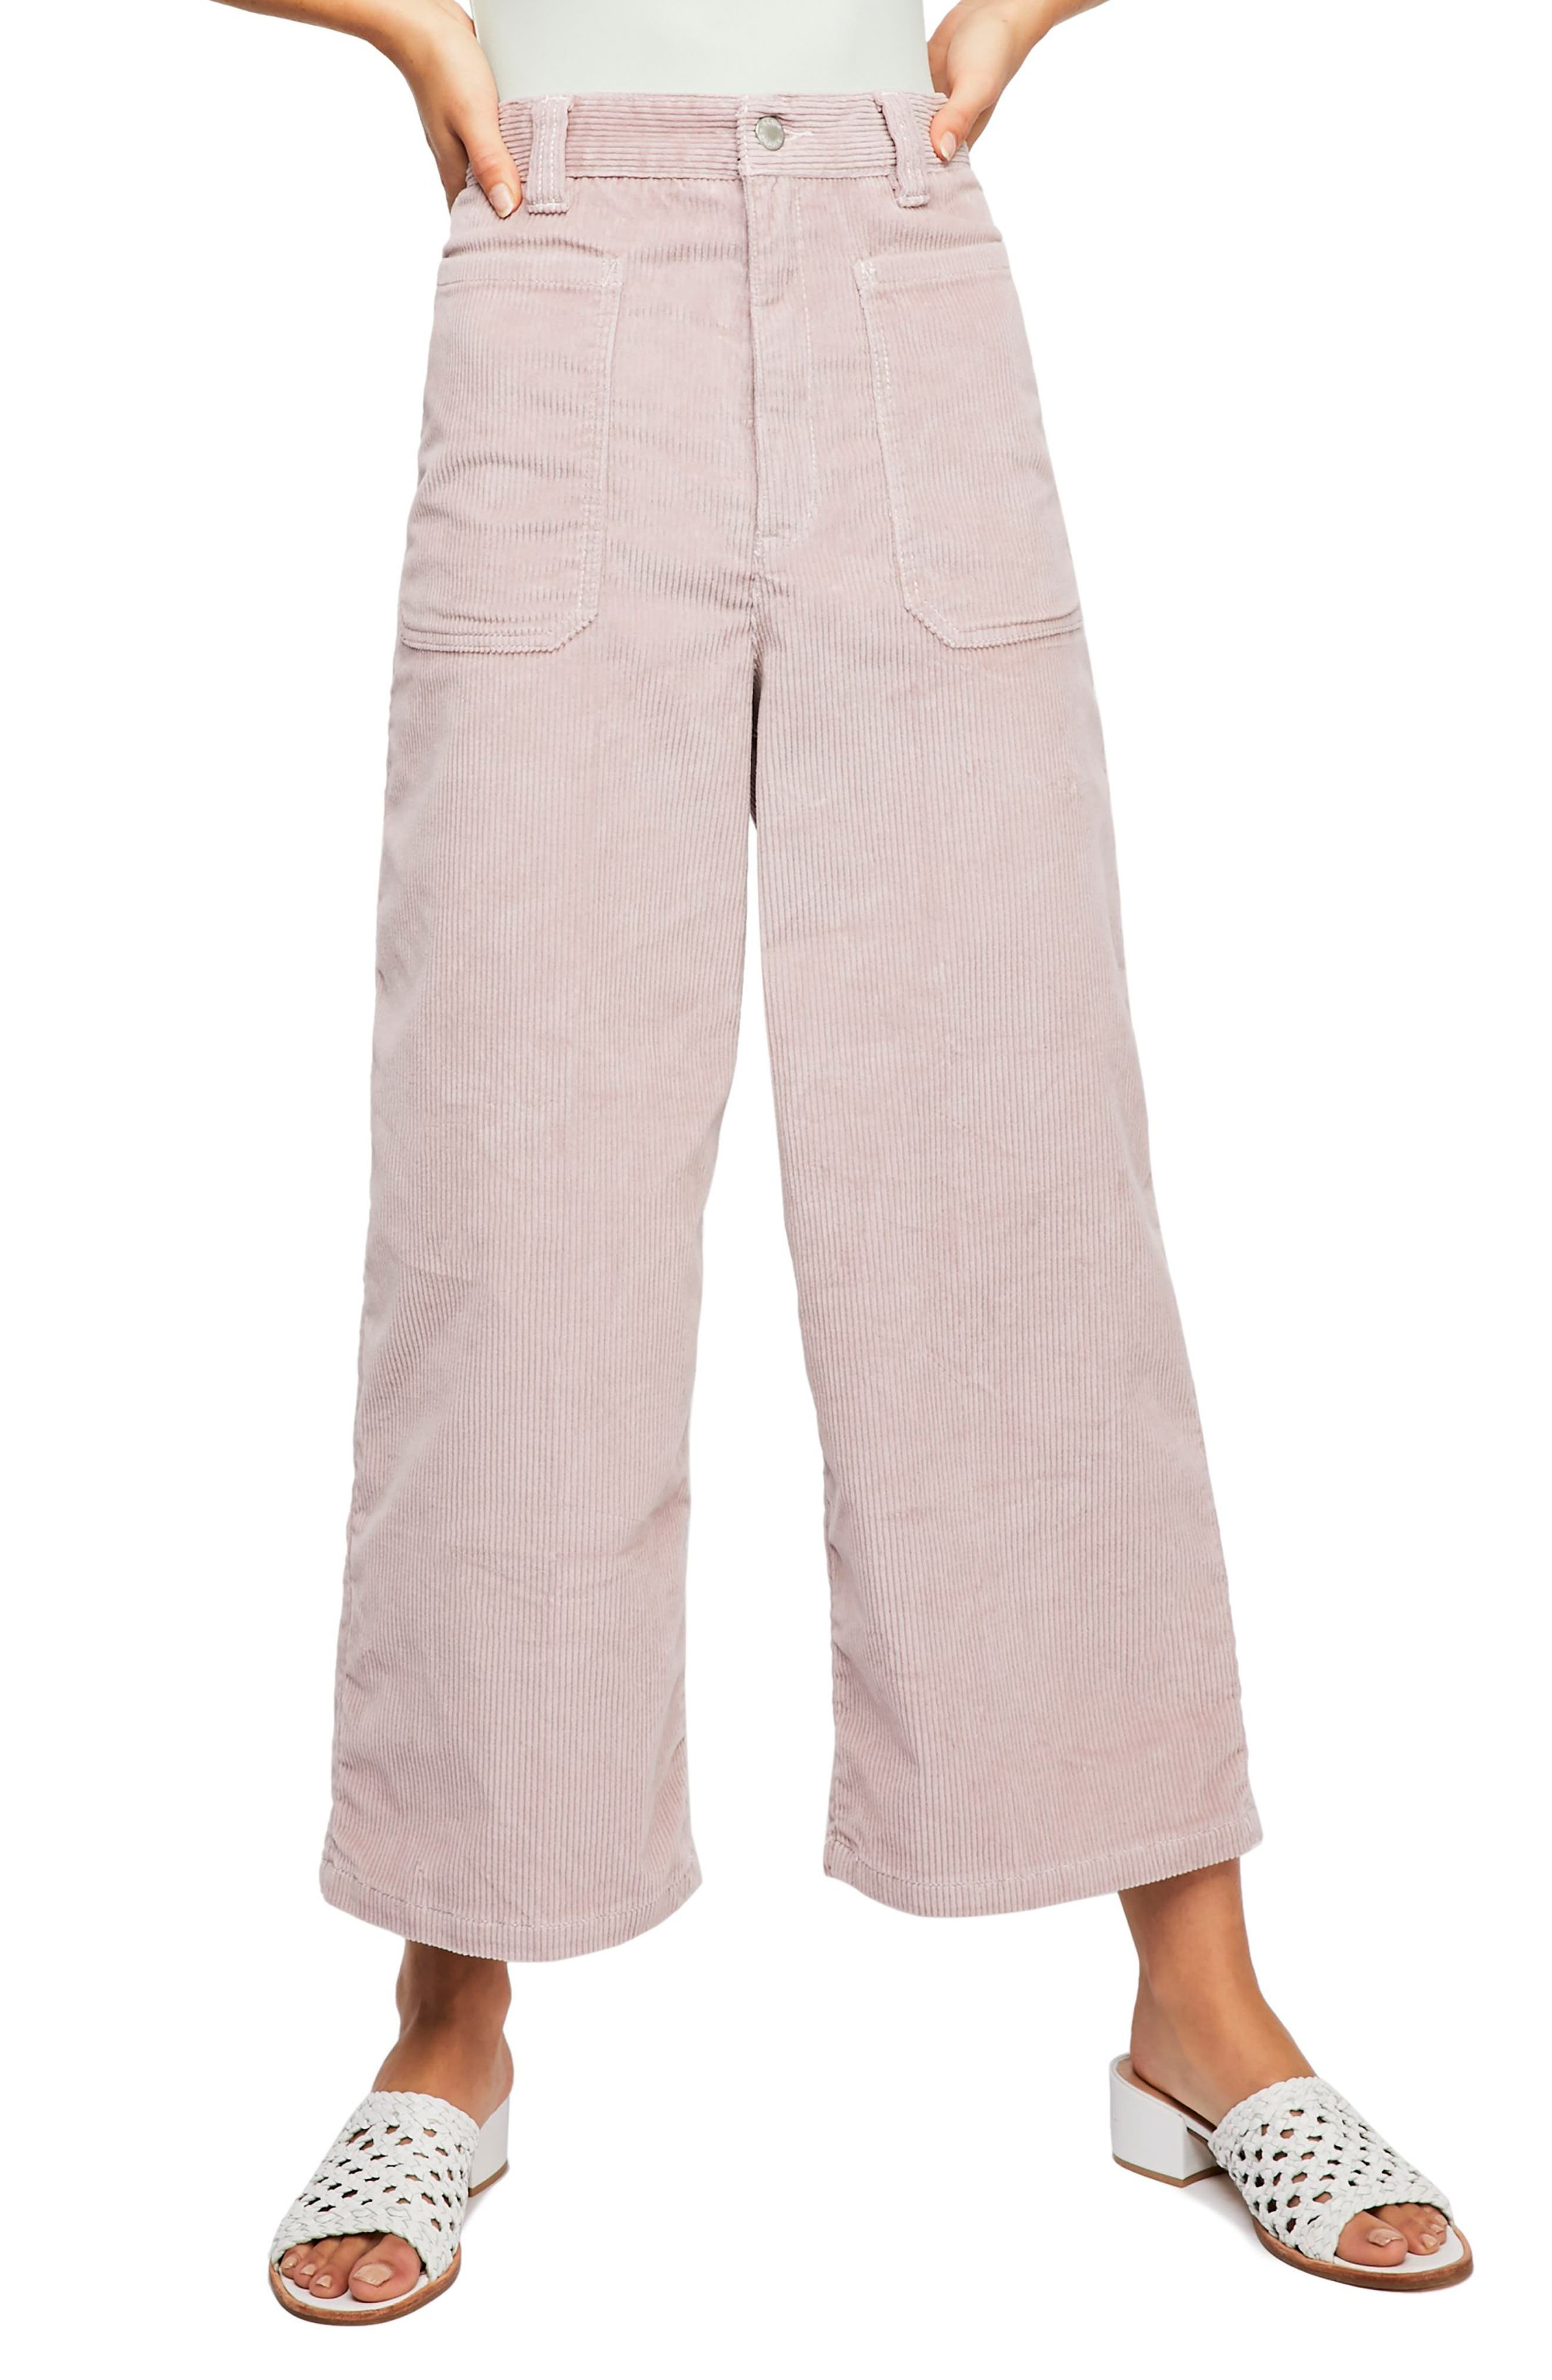 Dawn to Dusk Crop Corduroy Pants,                             Main thumbnail 1, color,                             ROSE